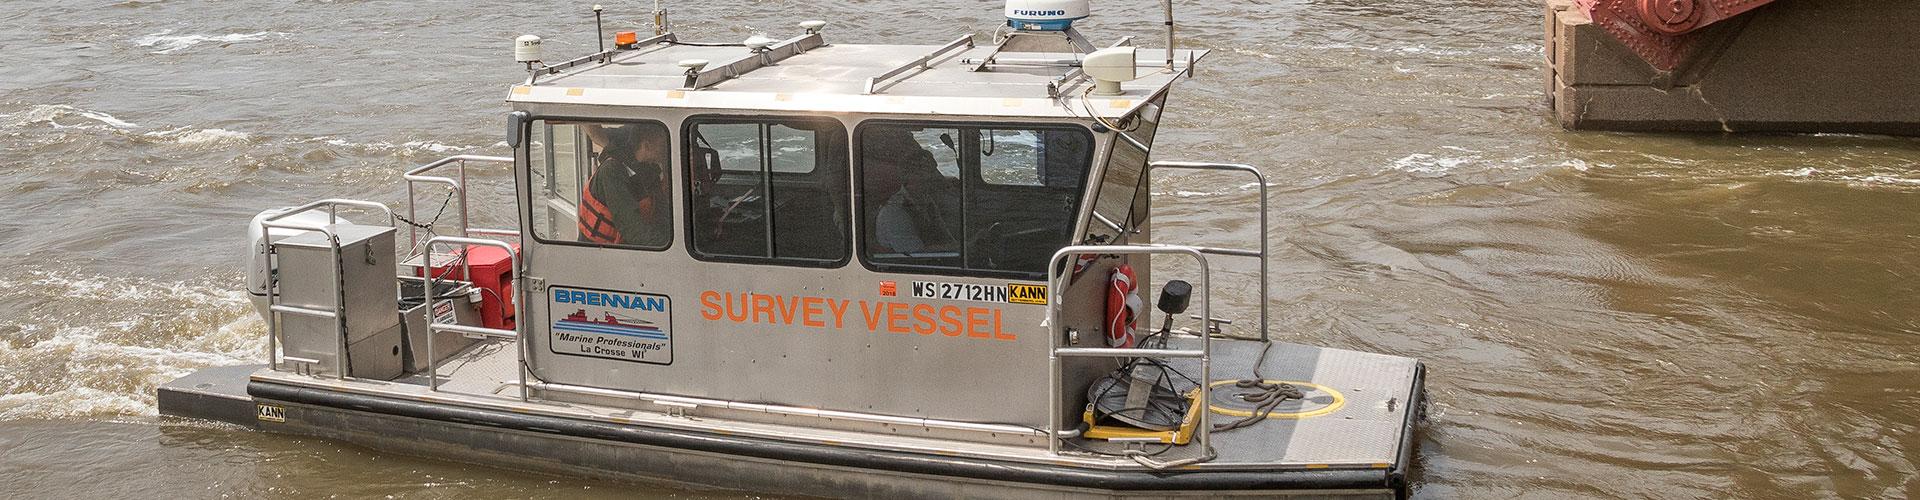 dam inspections, hydrographic survey, multibeam survey, underwater survey, bathymetric survey, dam surveys